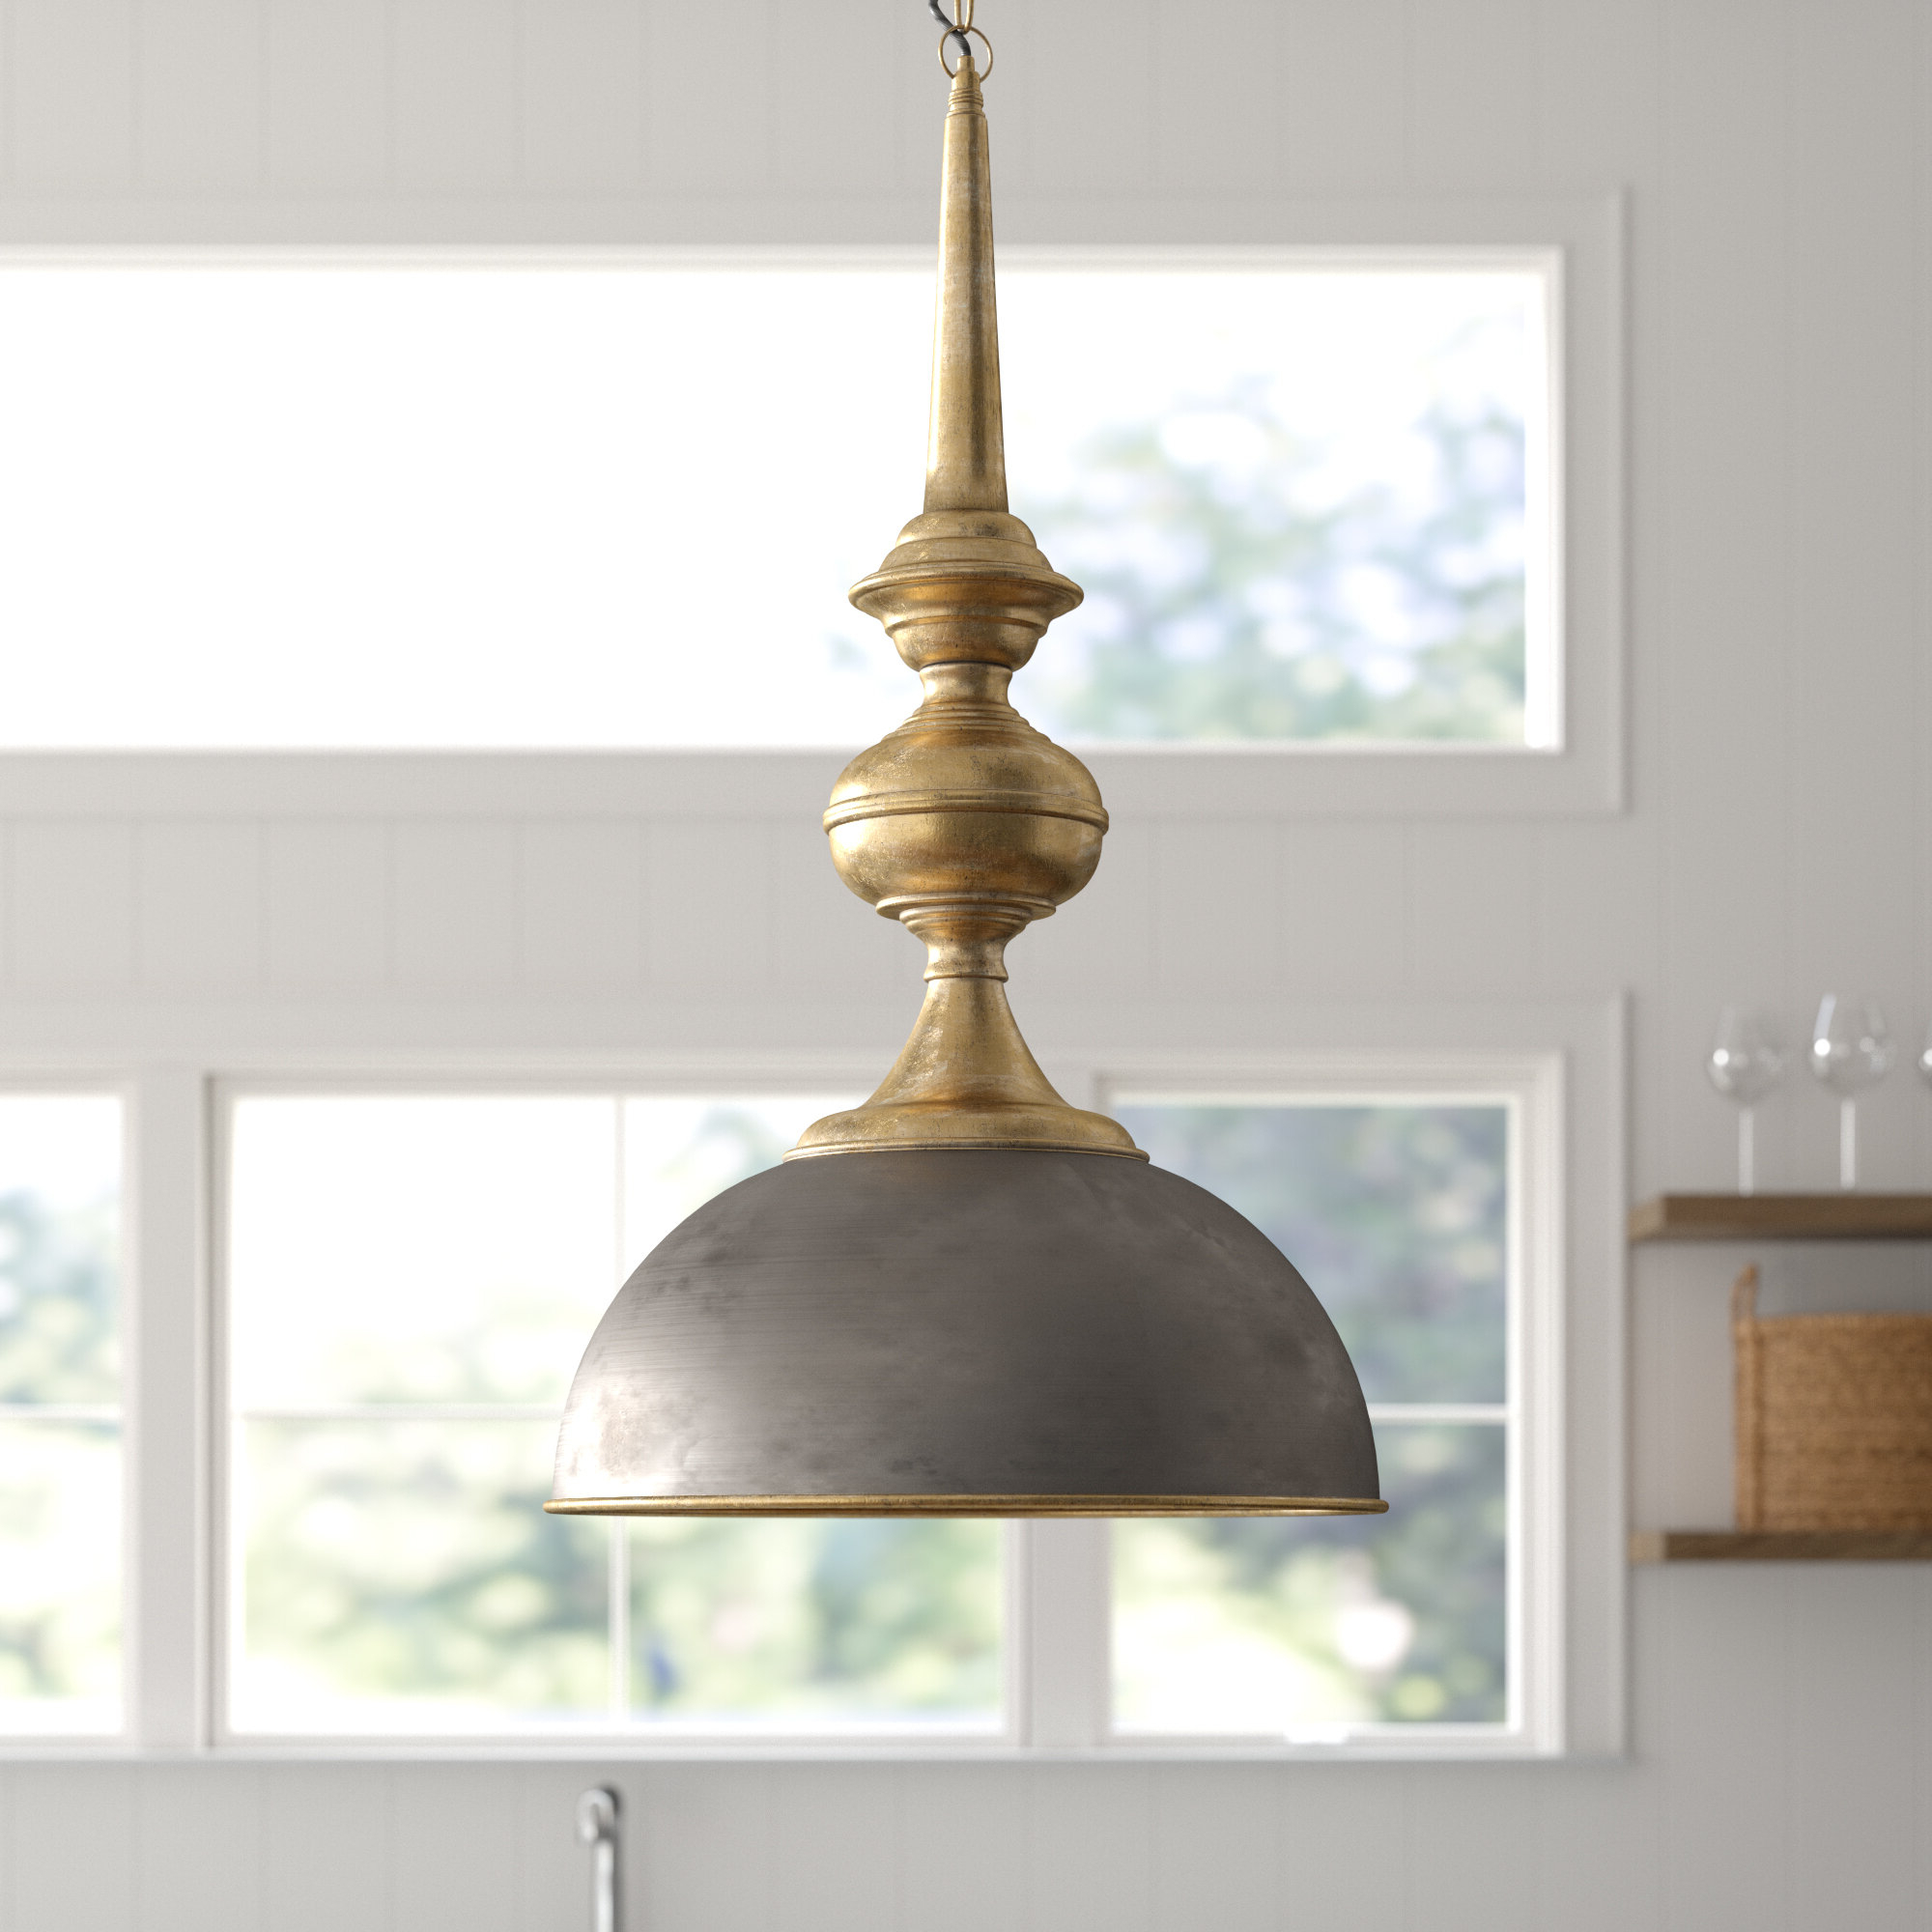 Mistana Corrine 1 Light Single Dome Pendant Throughout Fashionable Abordale 1 Light Single Dome Pendants (View 14 of 25)